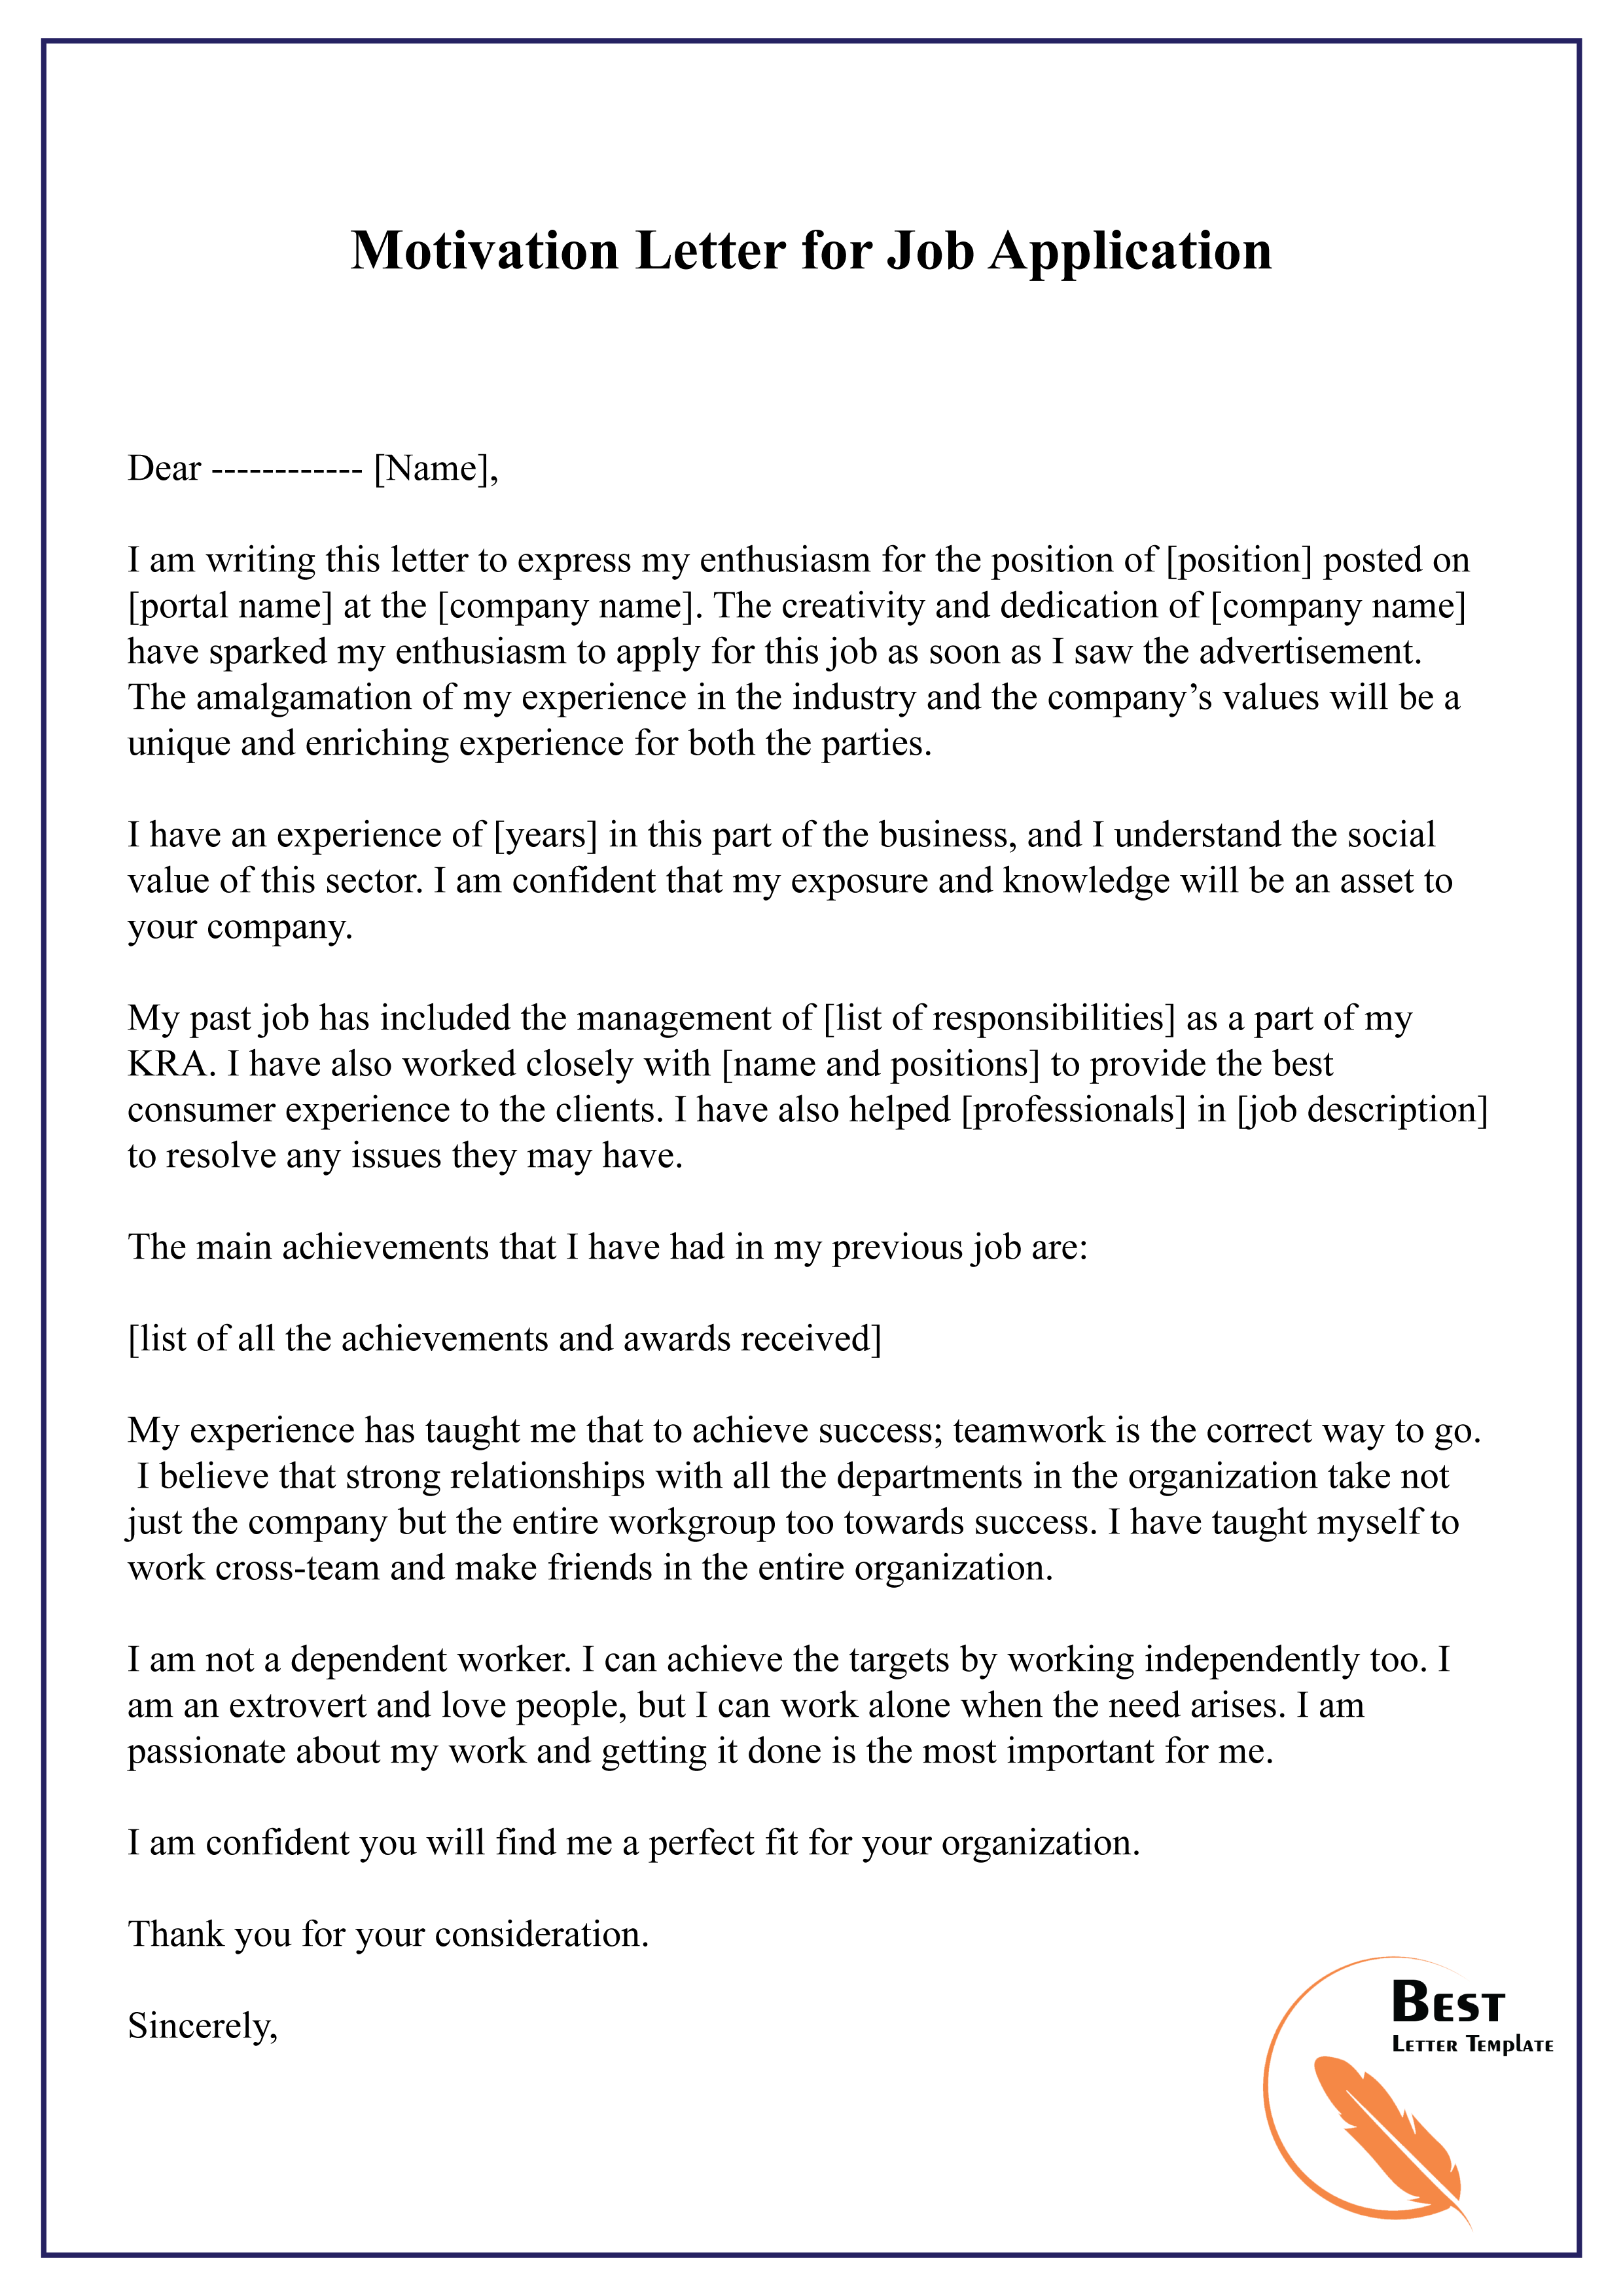 Motivation Letter For Job Application 01